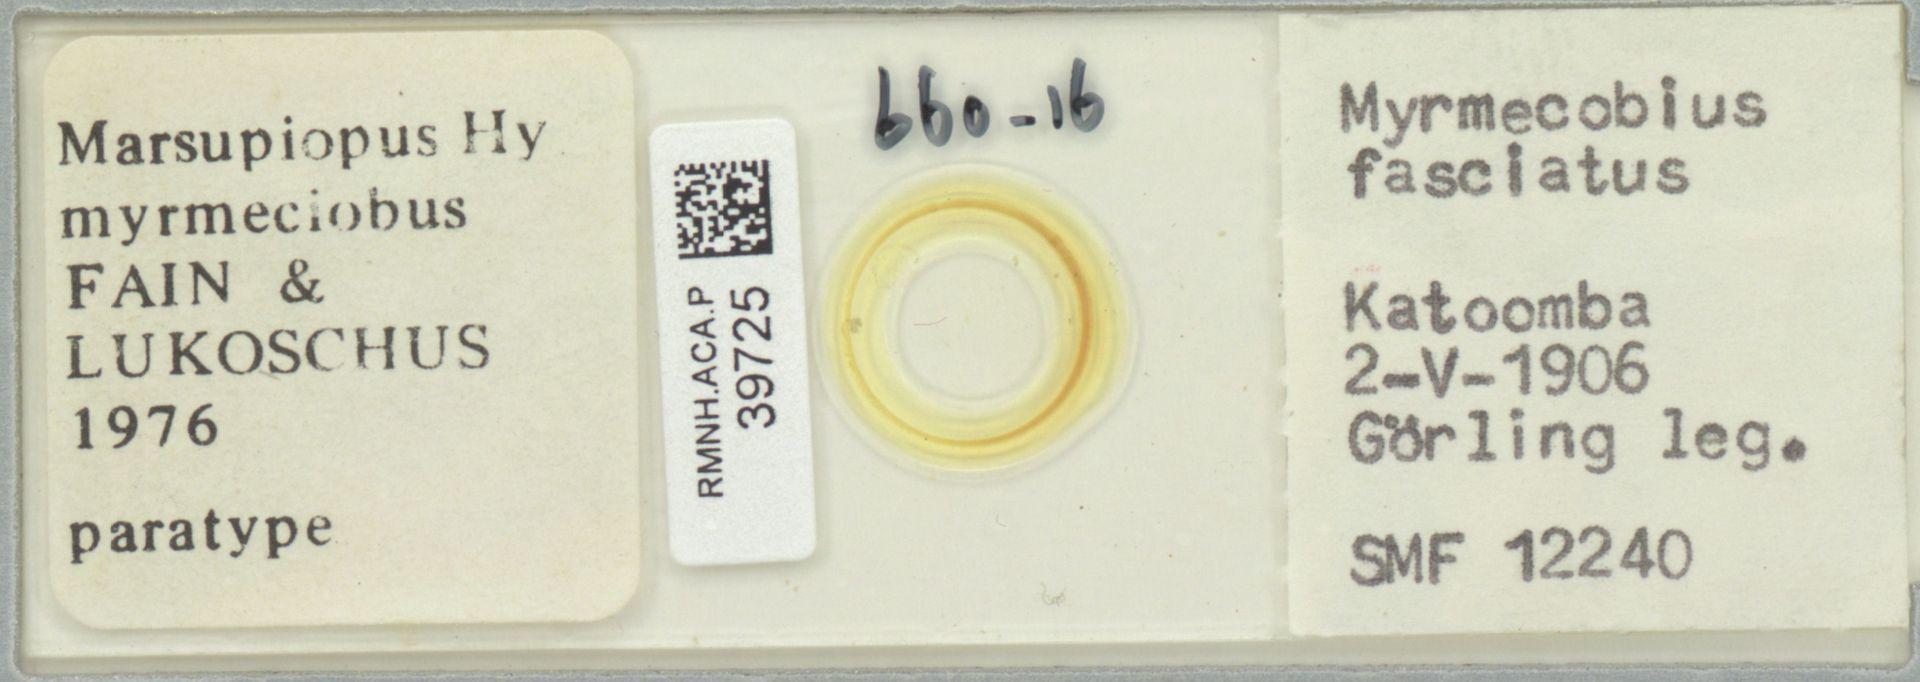 RMNH.ACA.P.39725   Marsupiopus (Hy) myrmeciobus Fain & Lukoschus 1976